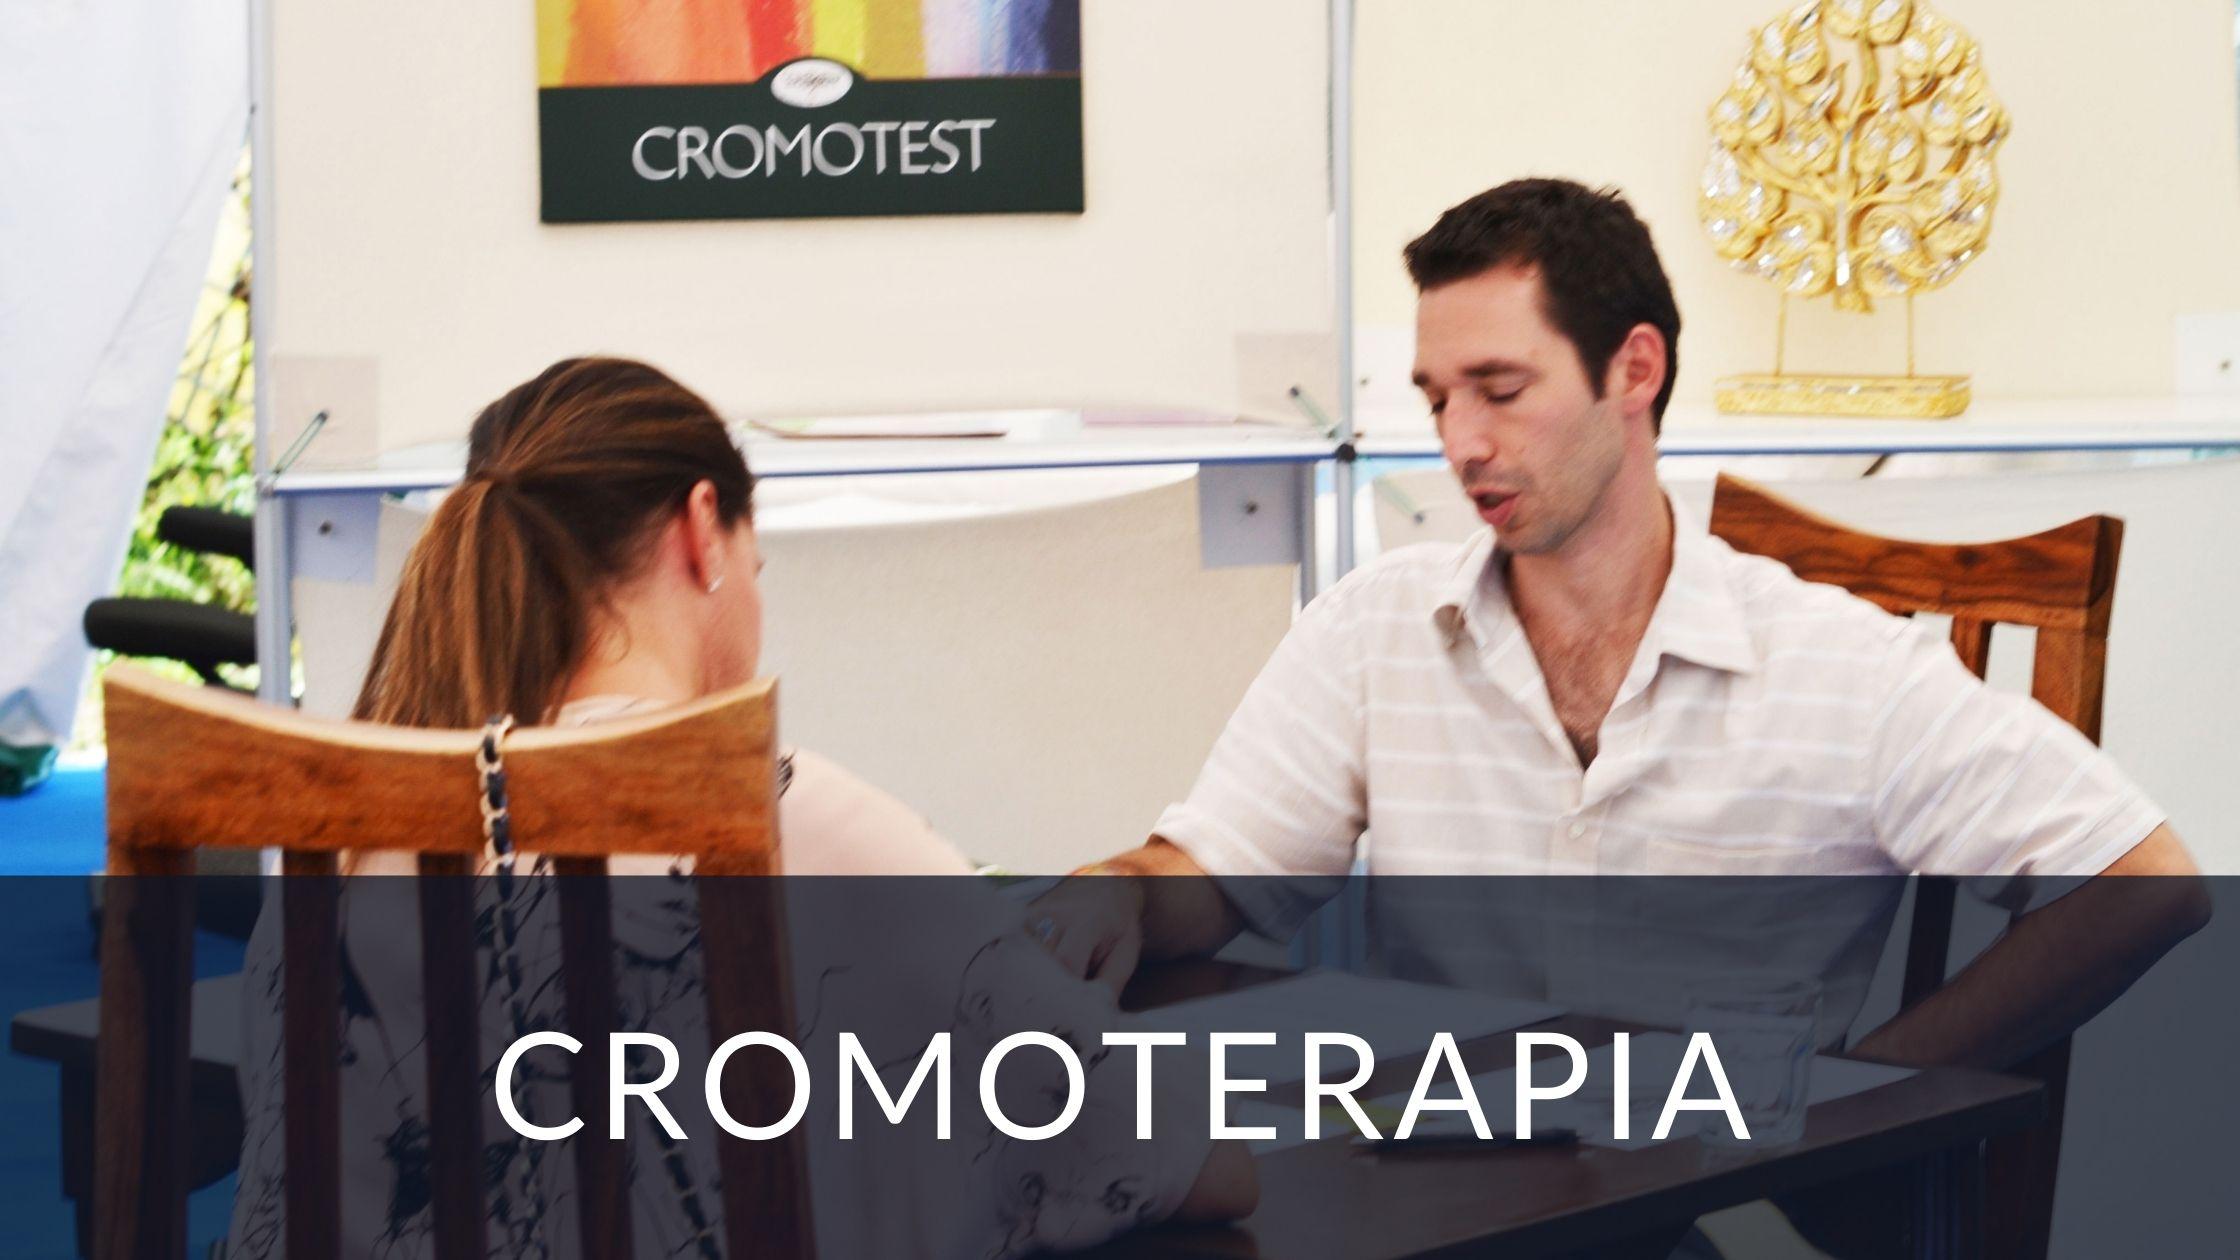 Cromoterapia a Piacenza, scoprine i benefici